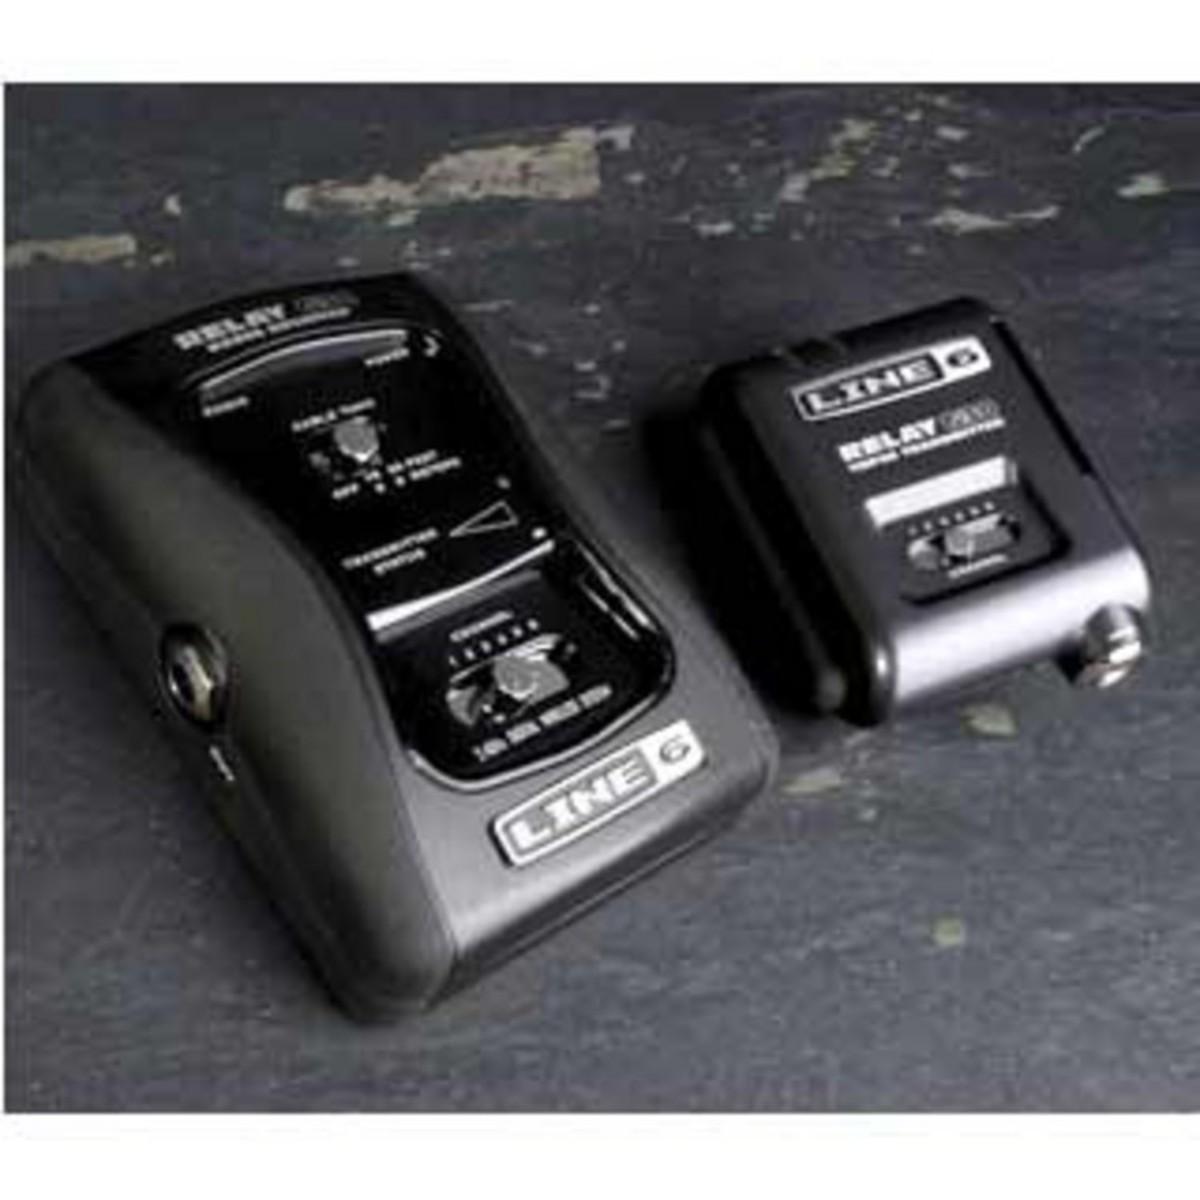 Line 6 relay g50 manual